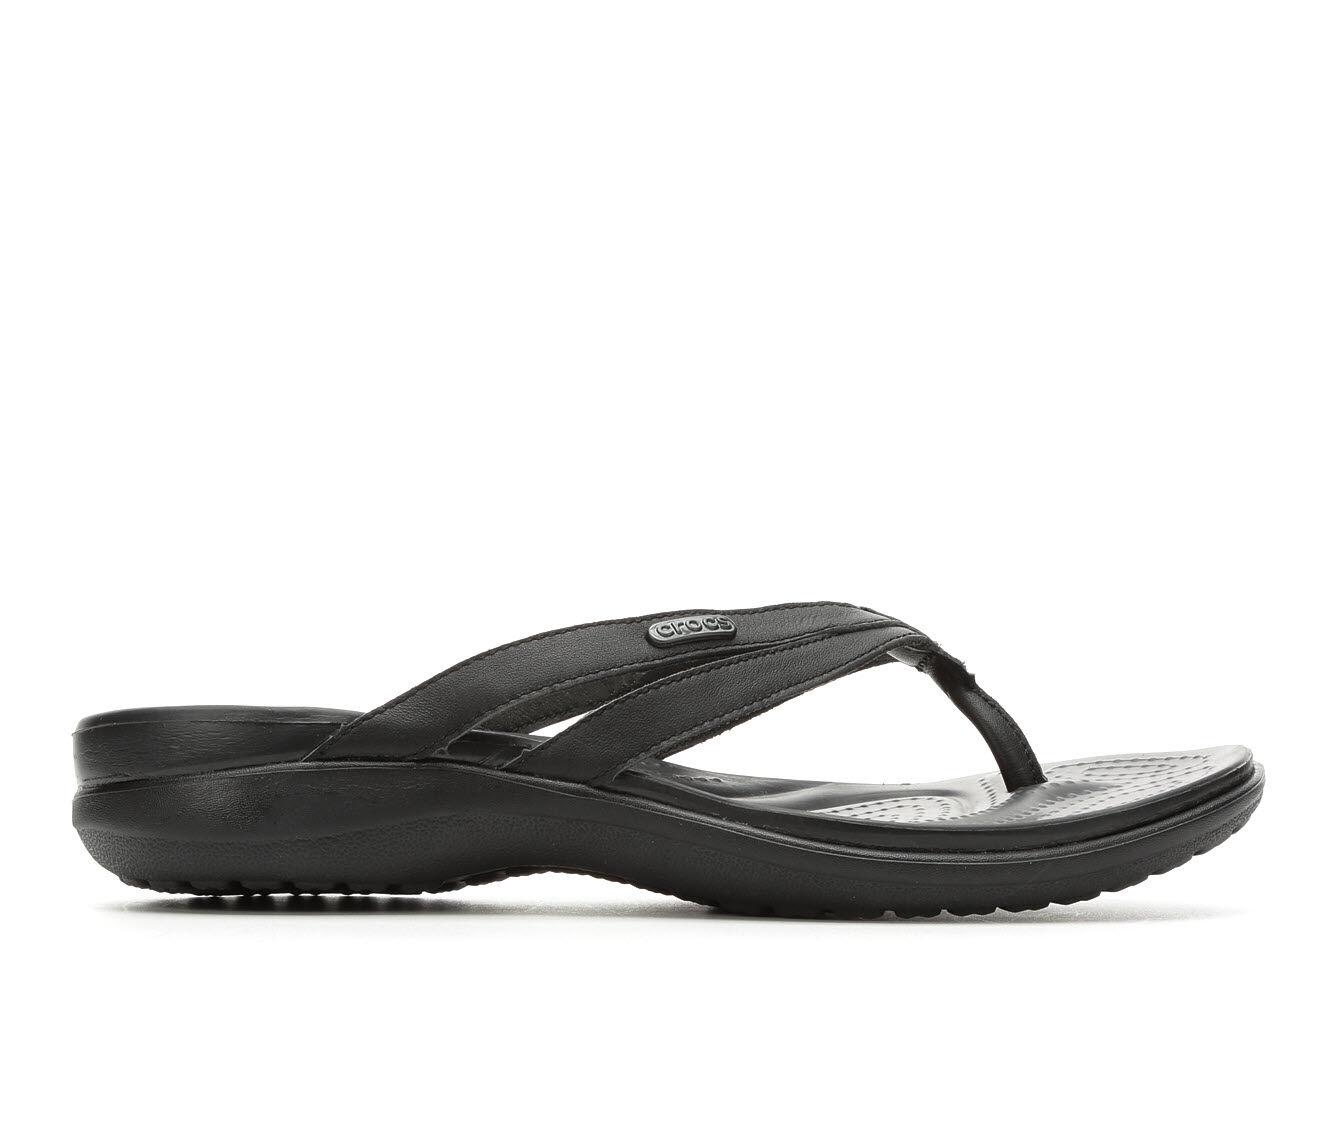 uk shoes_kd7126